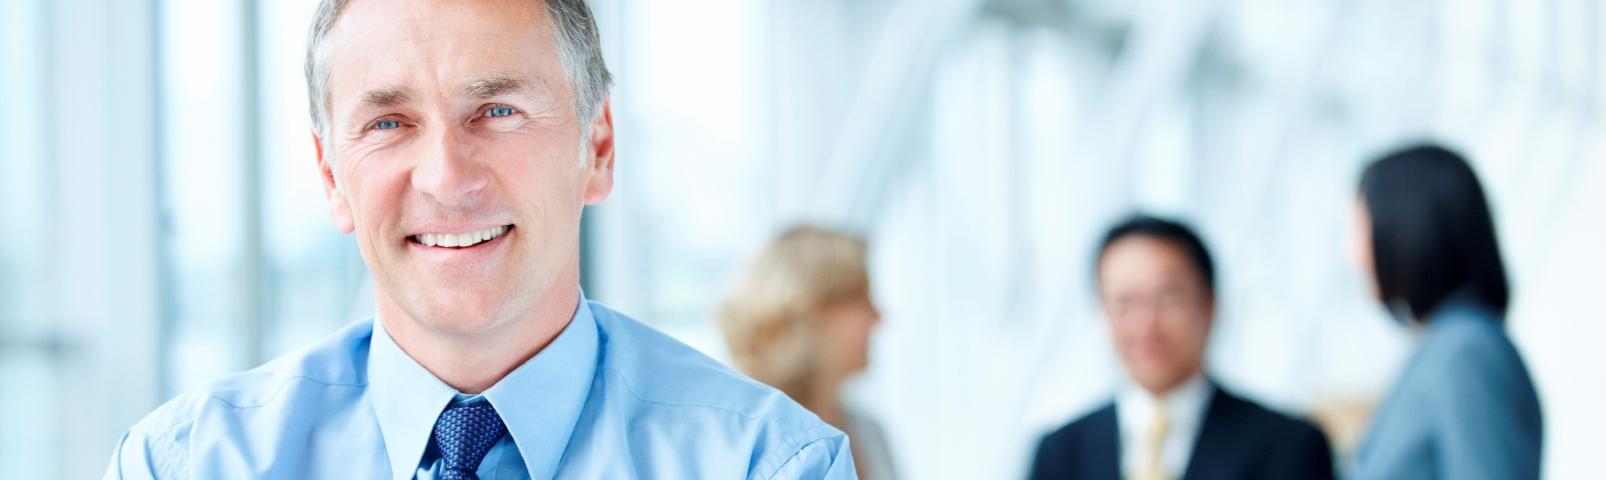 Effective Communication 4 Salespeople